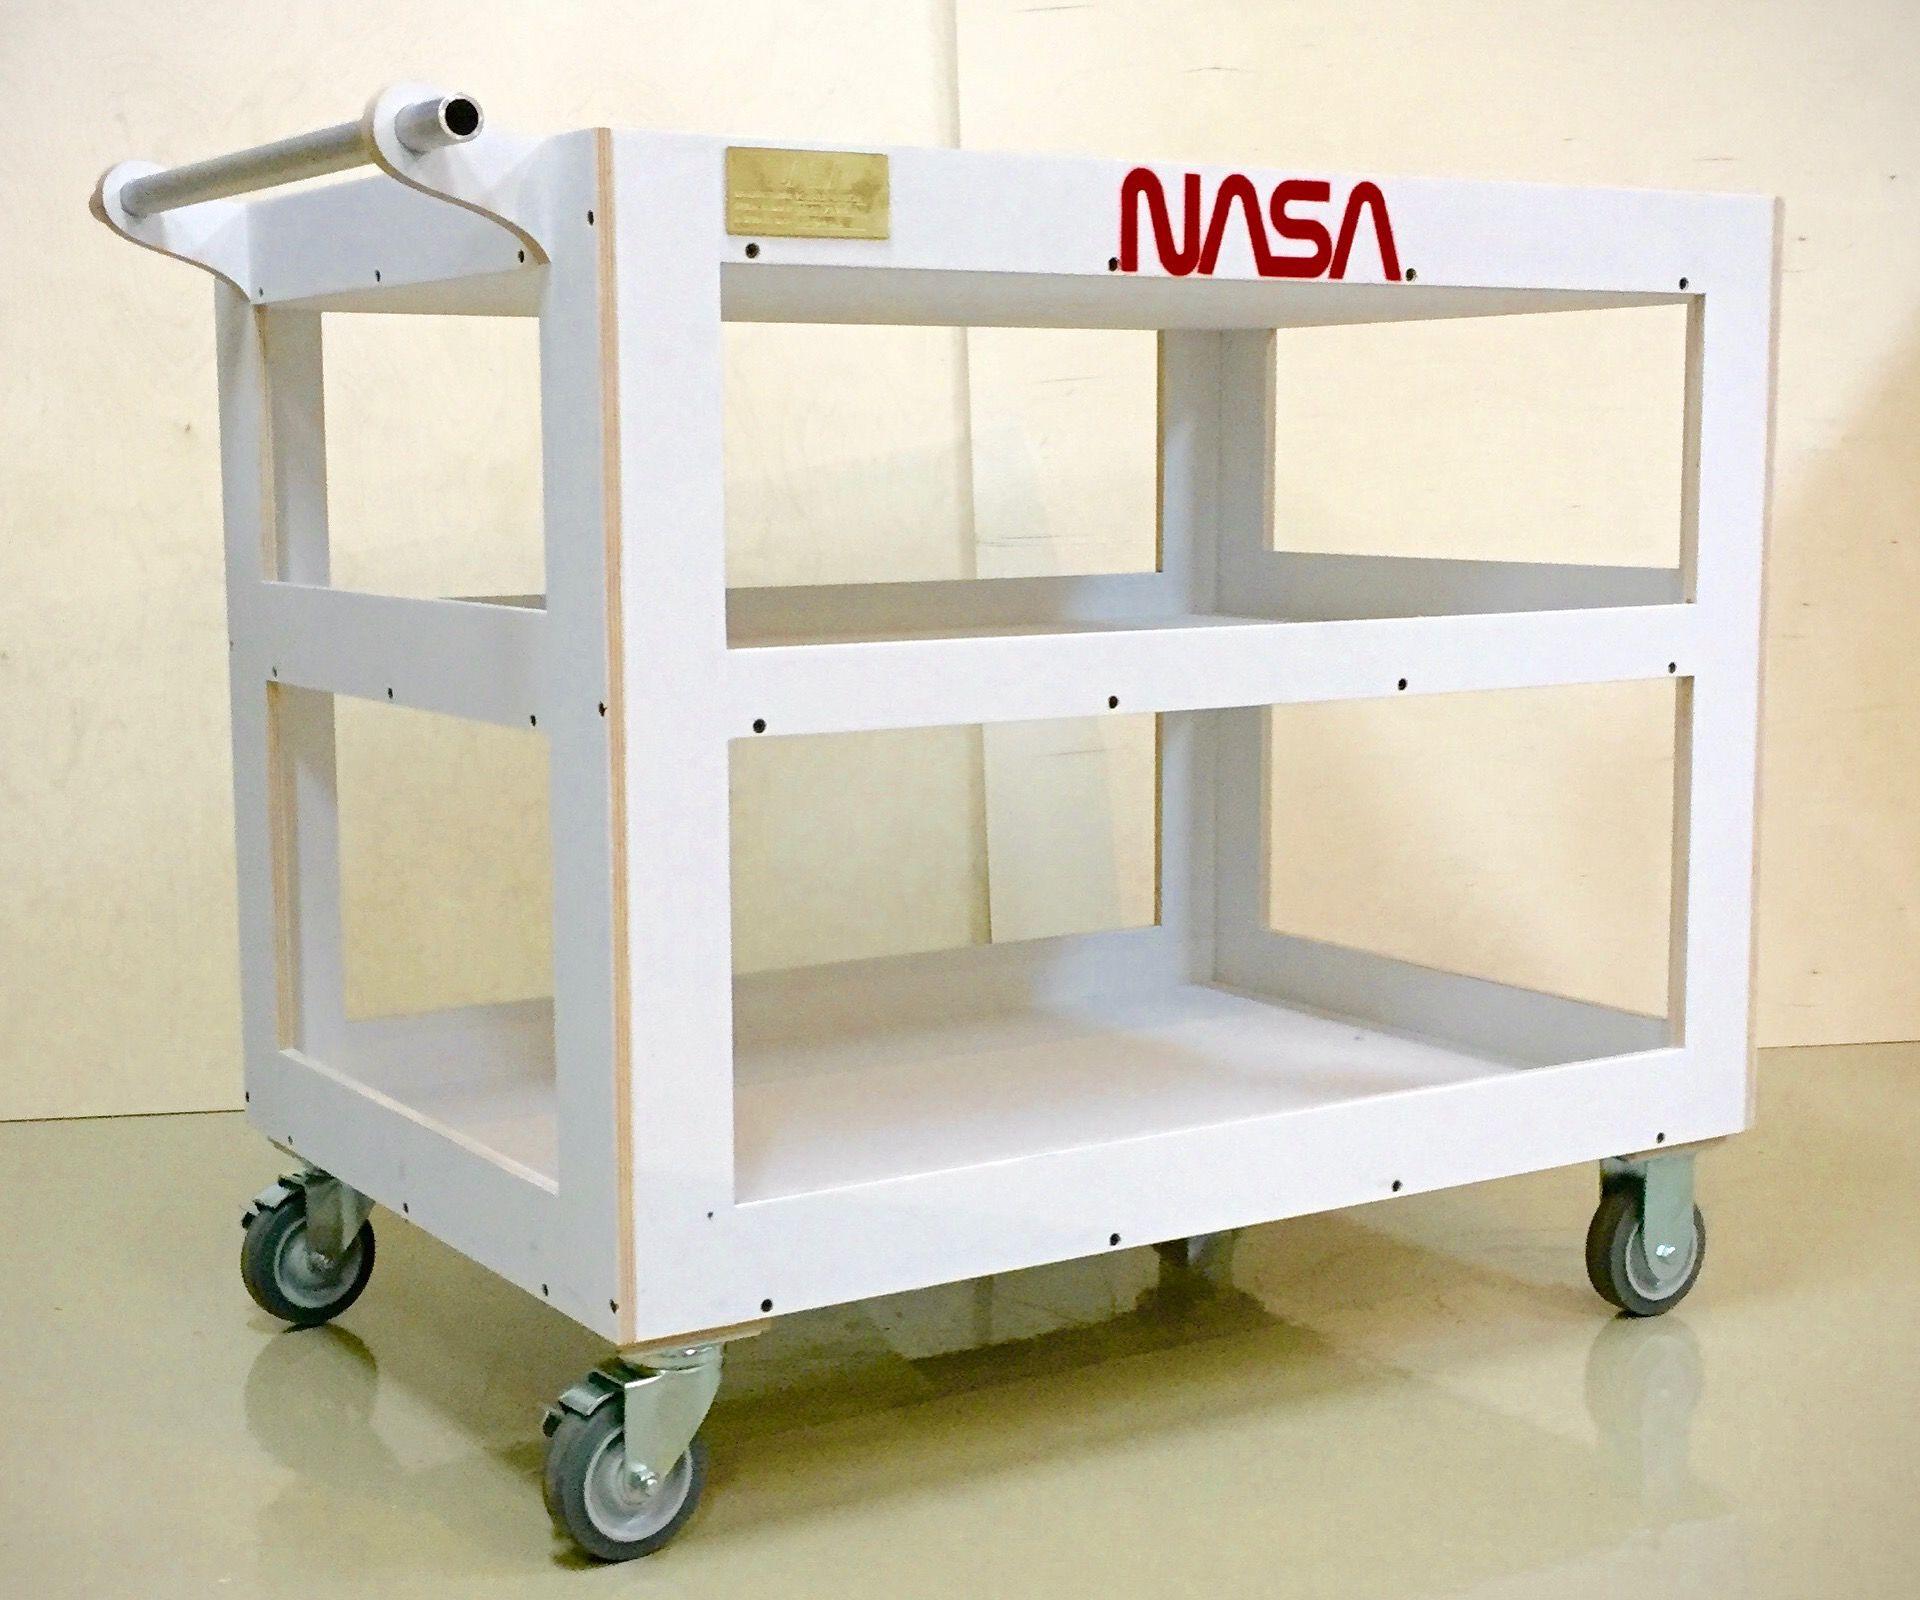 Simple NASA Utility Cart